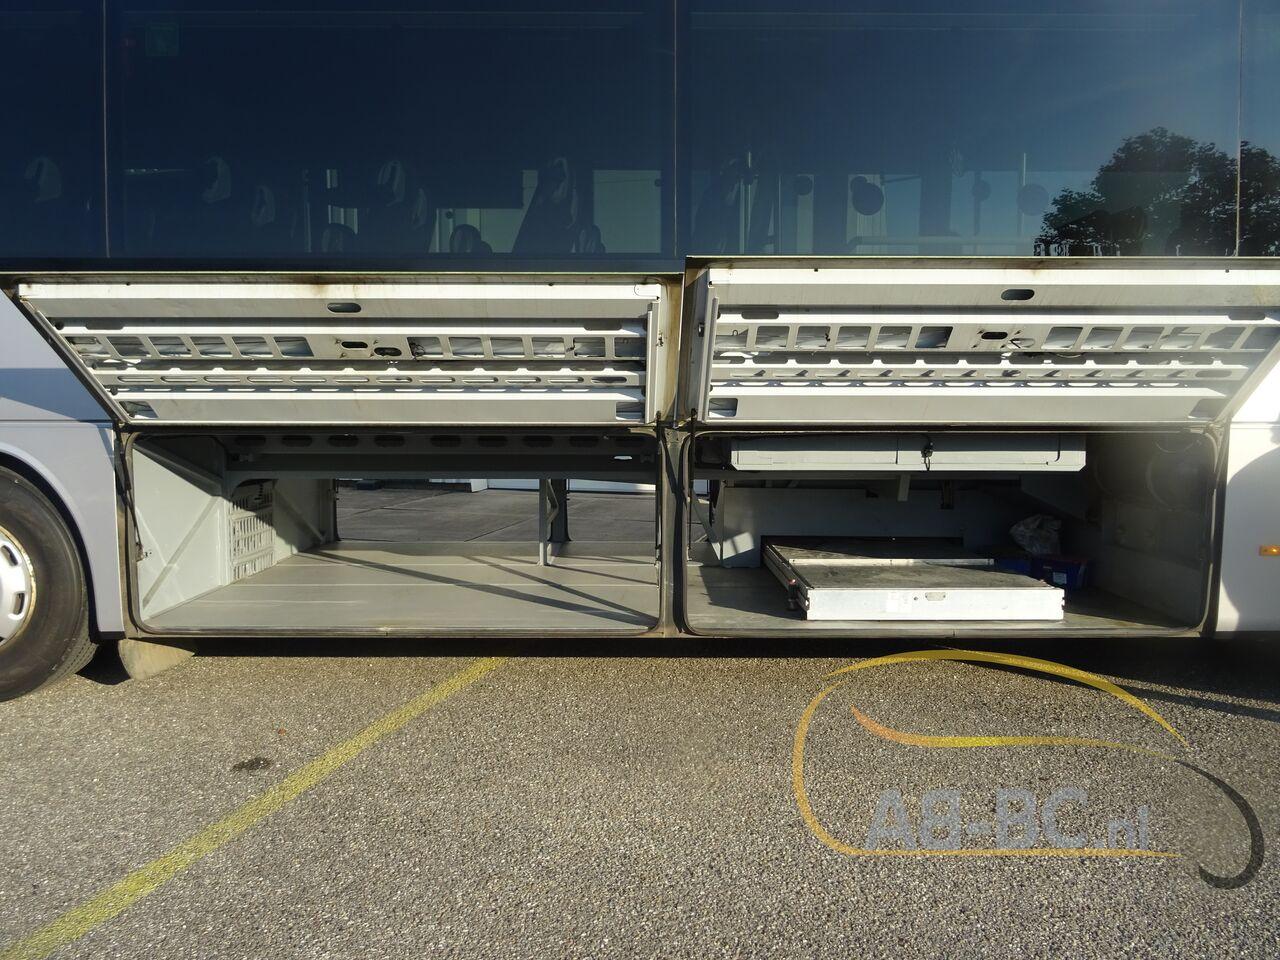 coach-bus-SETRA-S415H-52-Seats-EURO-6-Liftbus---1630913035678275180_big_40639910e395da02aa9a5aff9f750b88--21070517141280735500